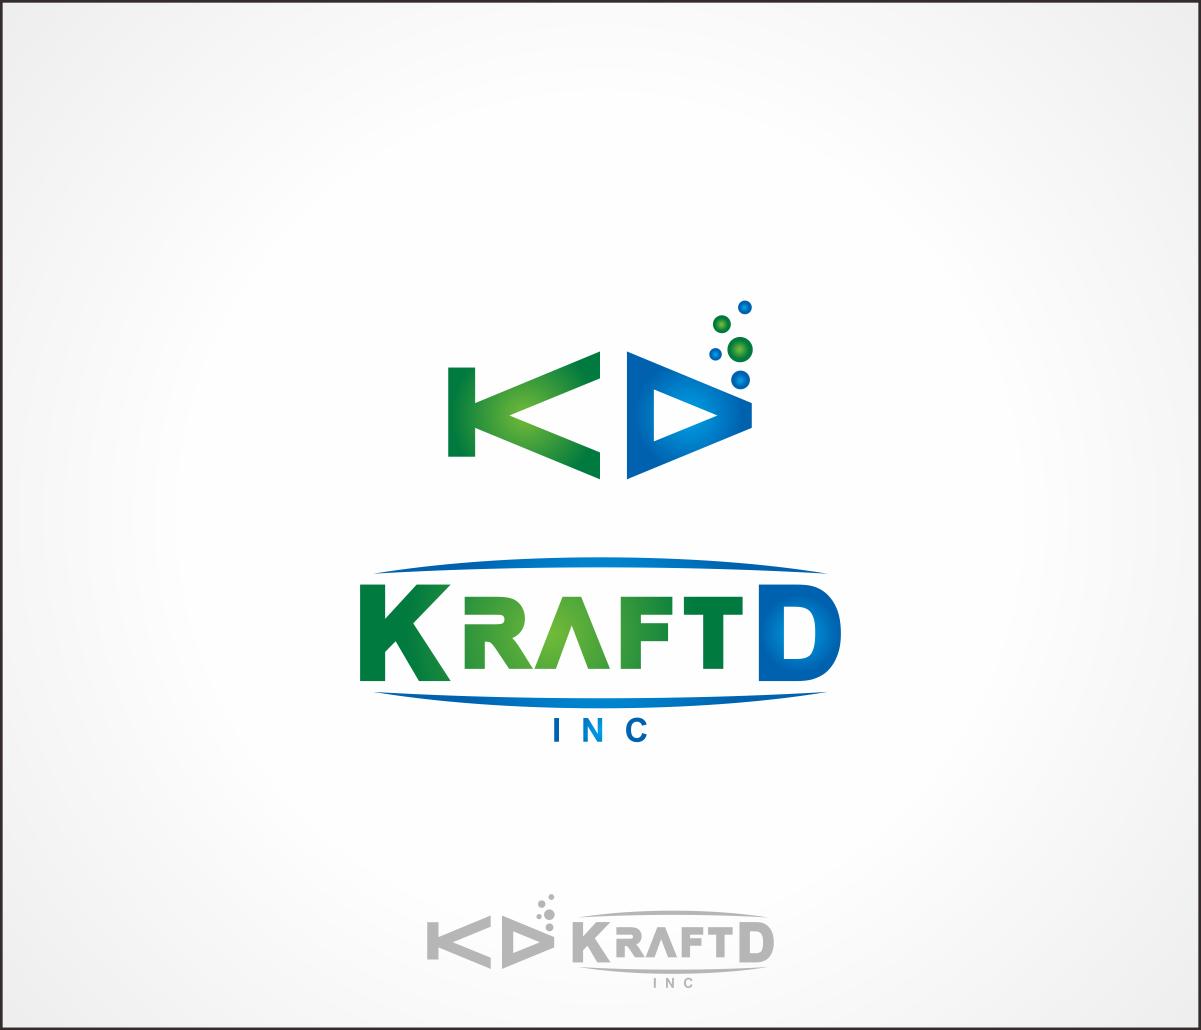 Logo Design by Armada Jamaluddin - Entry No. 261 in the Logo Design Contest Unique Logo Design Wanted for Kraft D Inc.